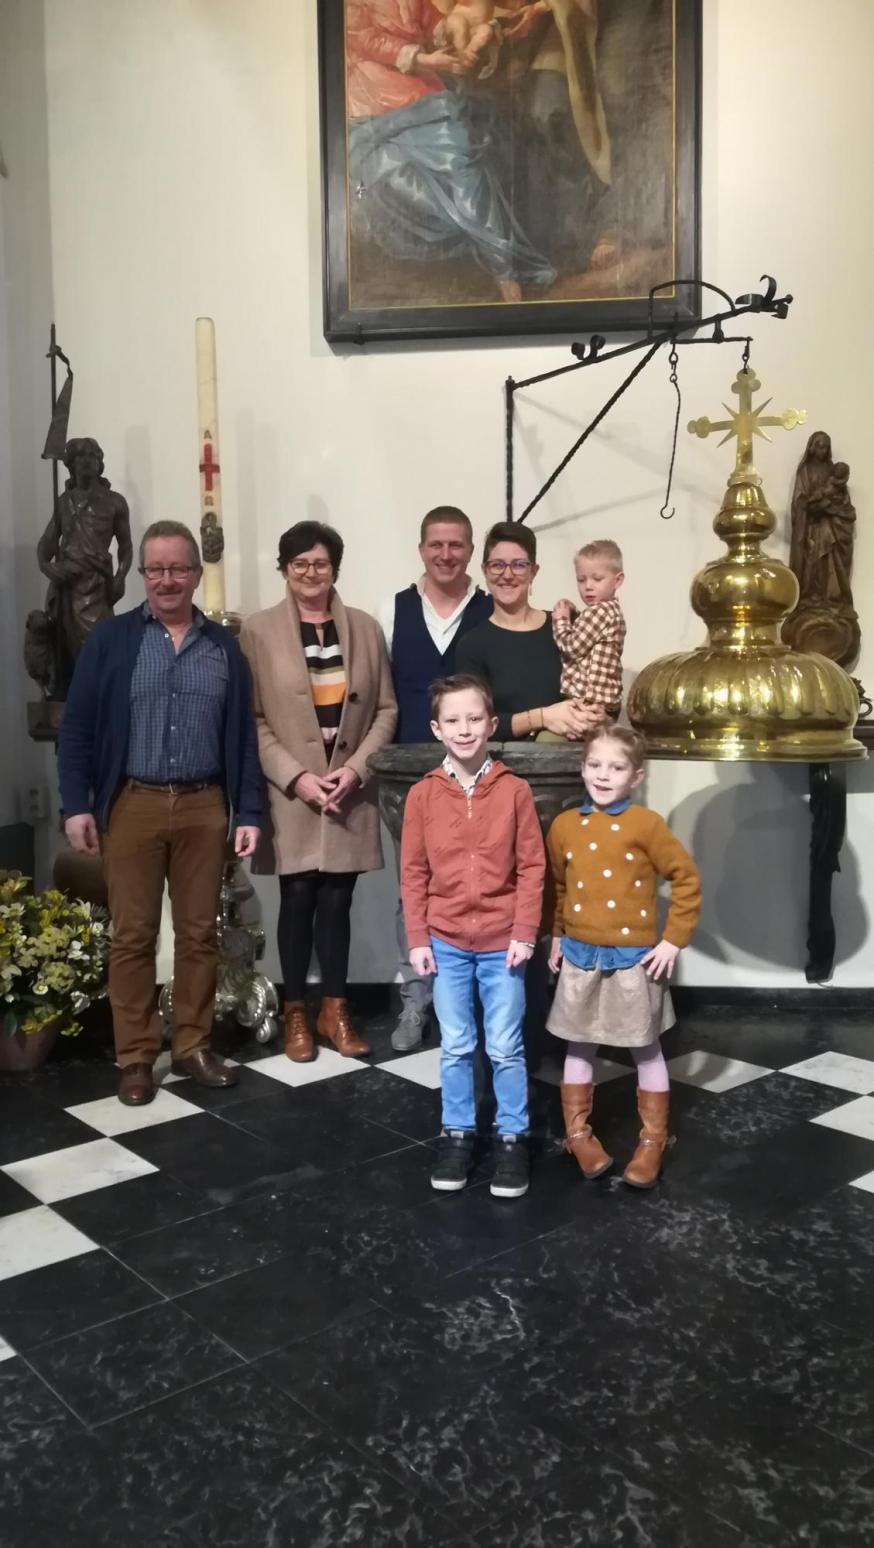 dopeling Arne © parochie Onze-Lieve-Vrouw Lichtaart